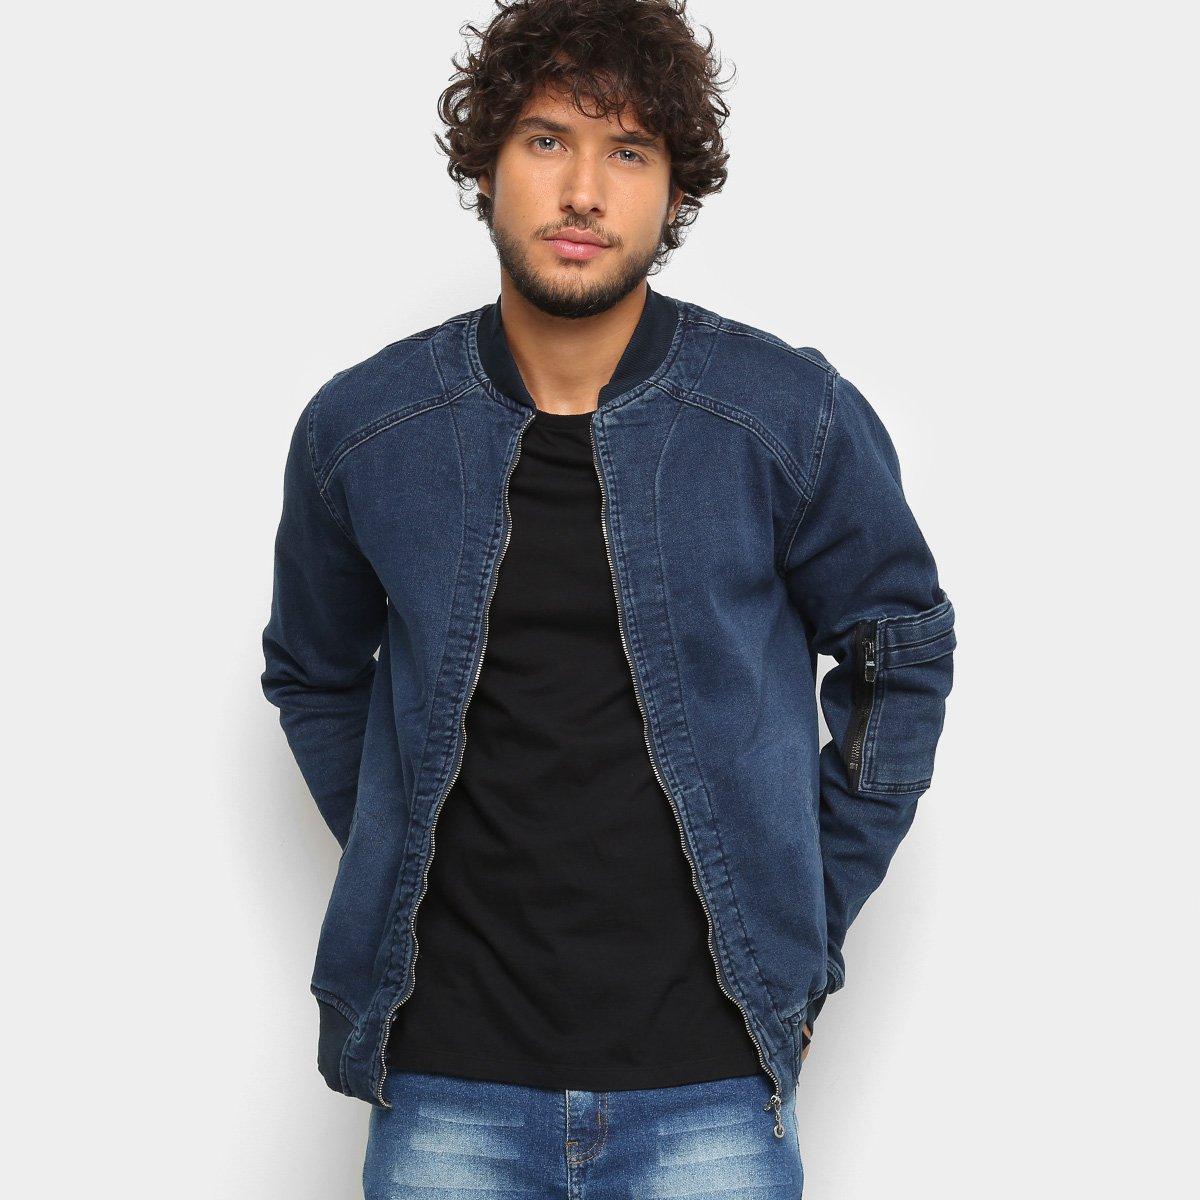 Foto 1 - Jaqueta Bomber Jeans Zune Recortes Masculina